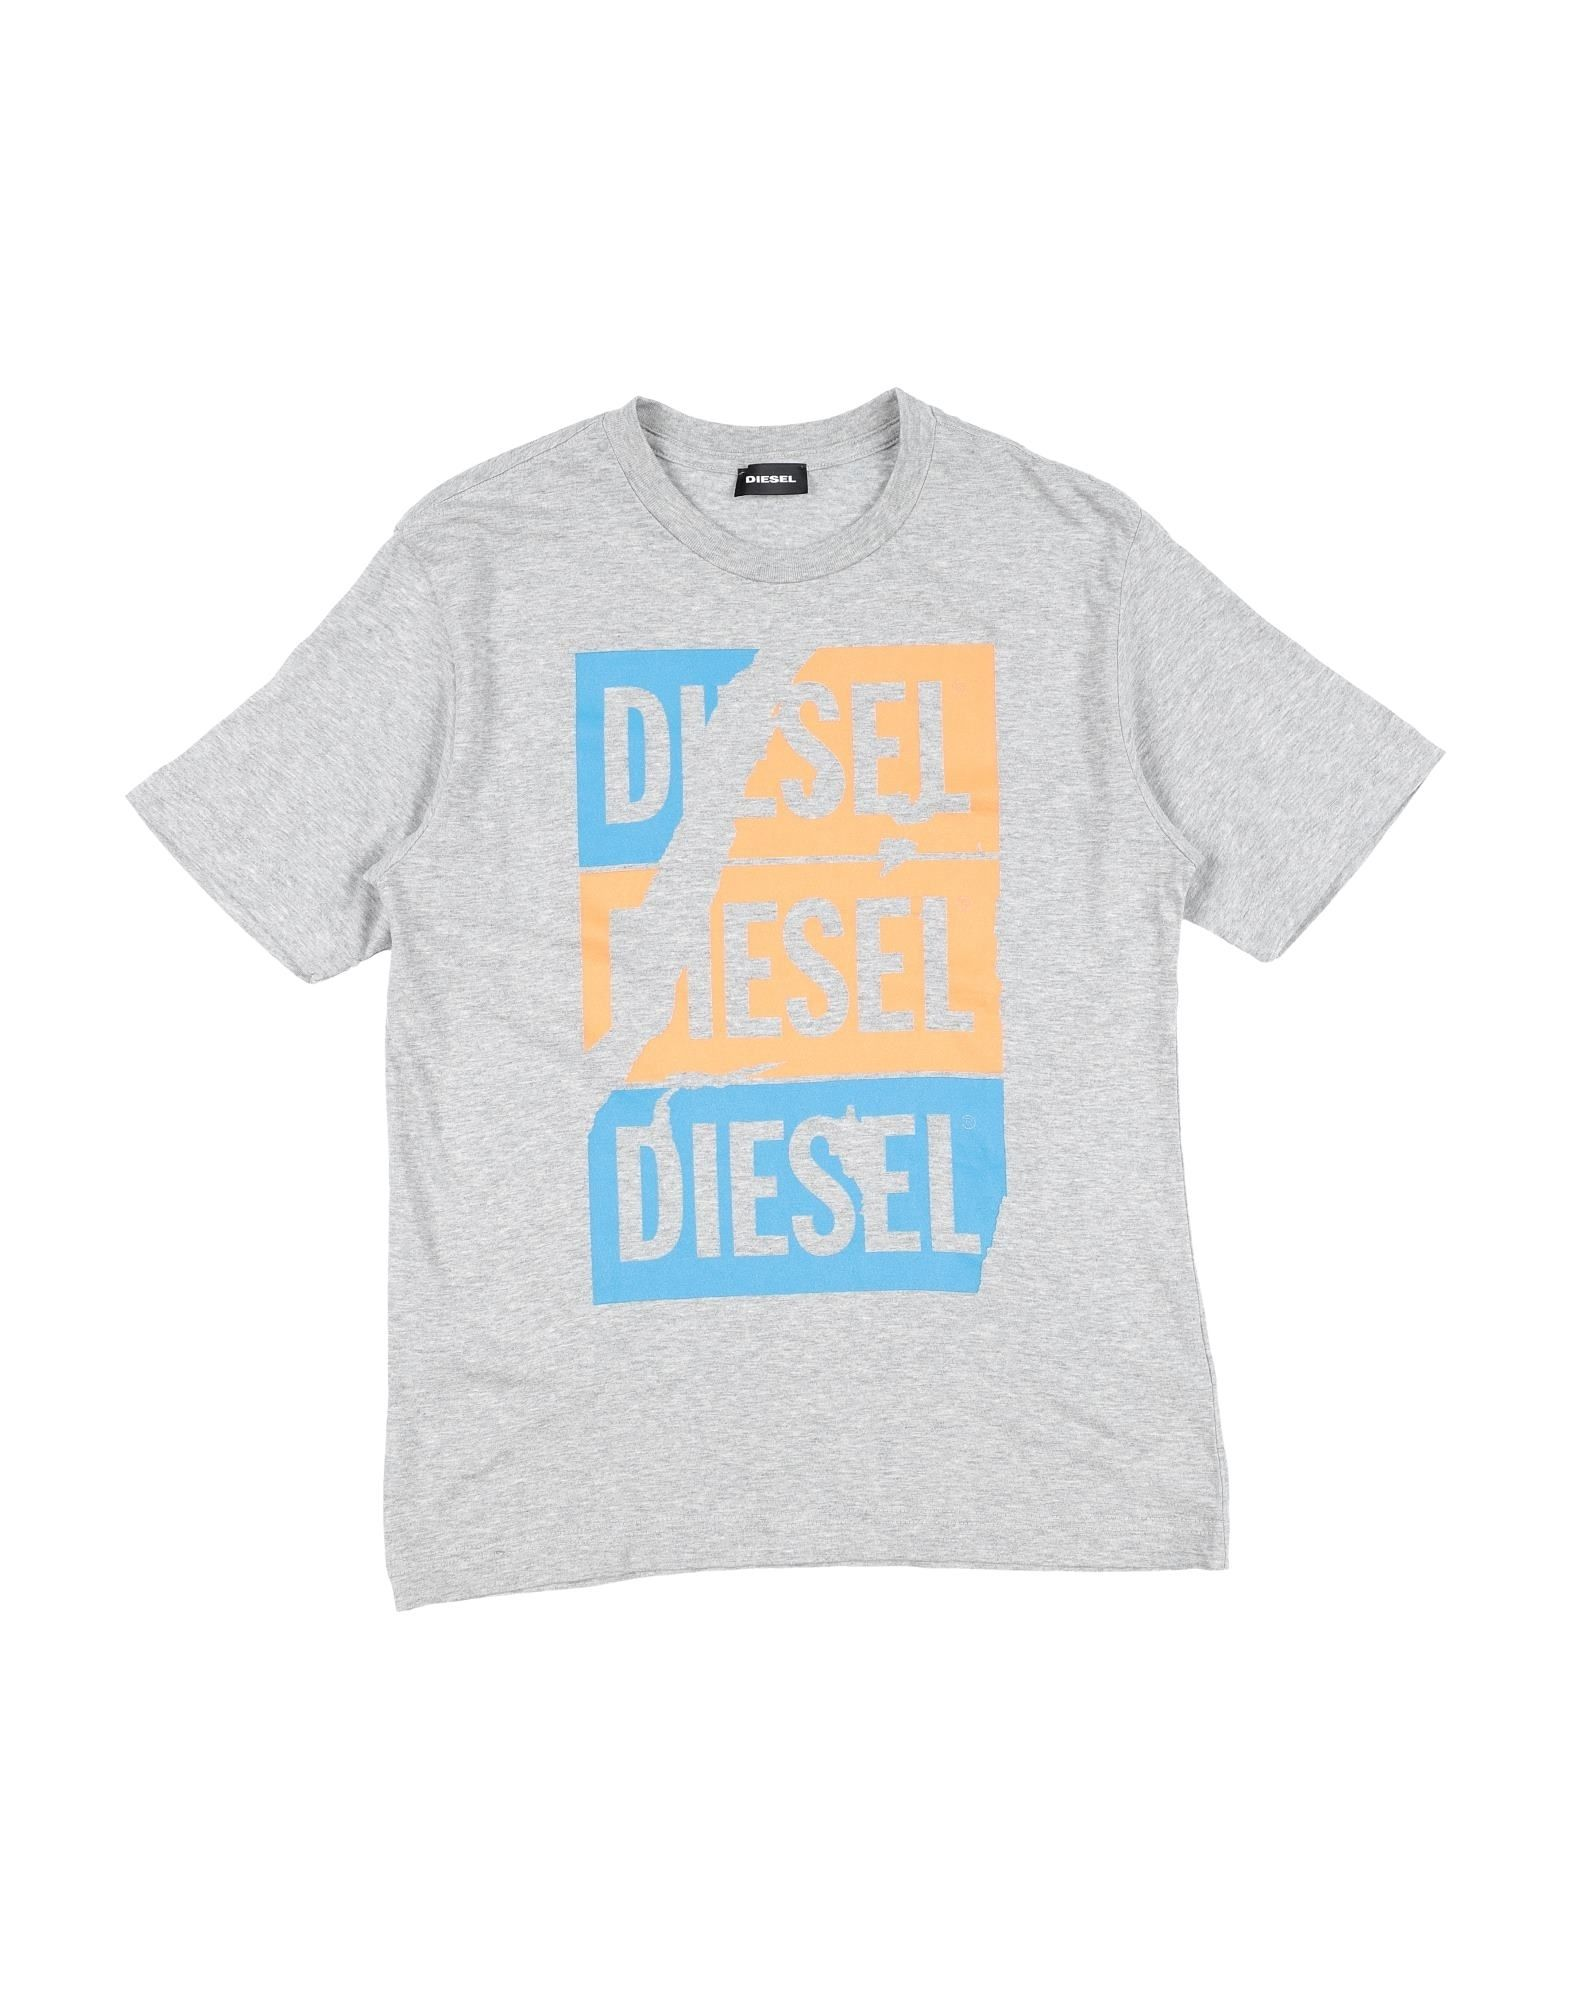 Diesel Kids' T-shirts In Gray